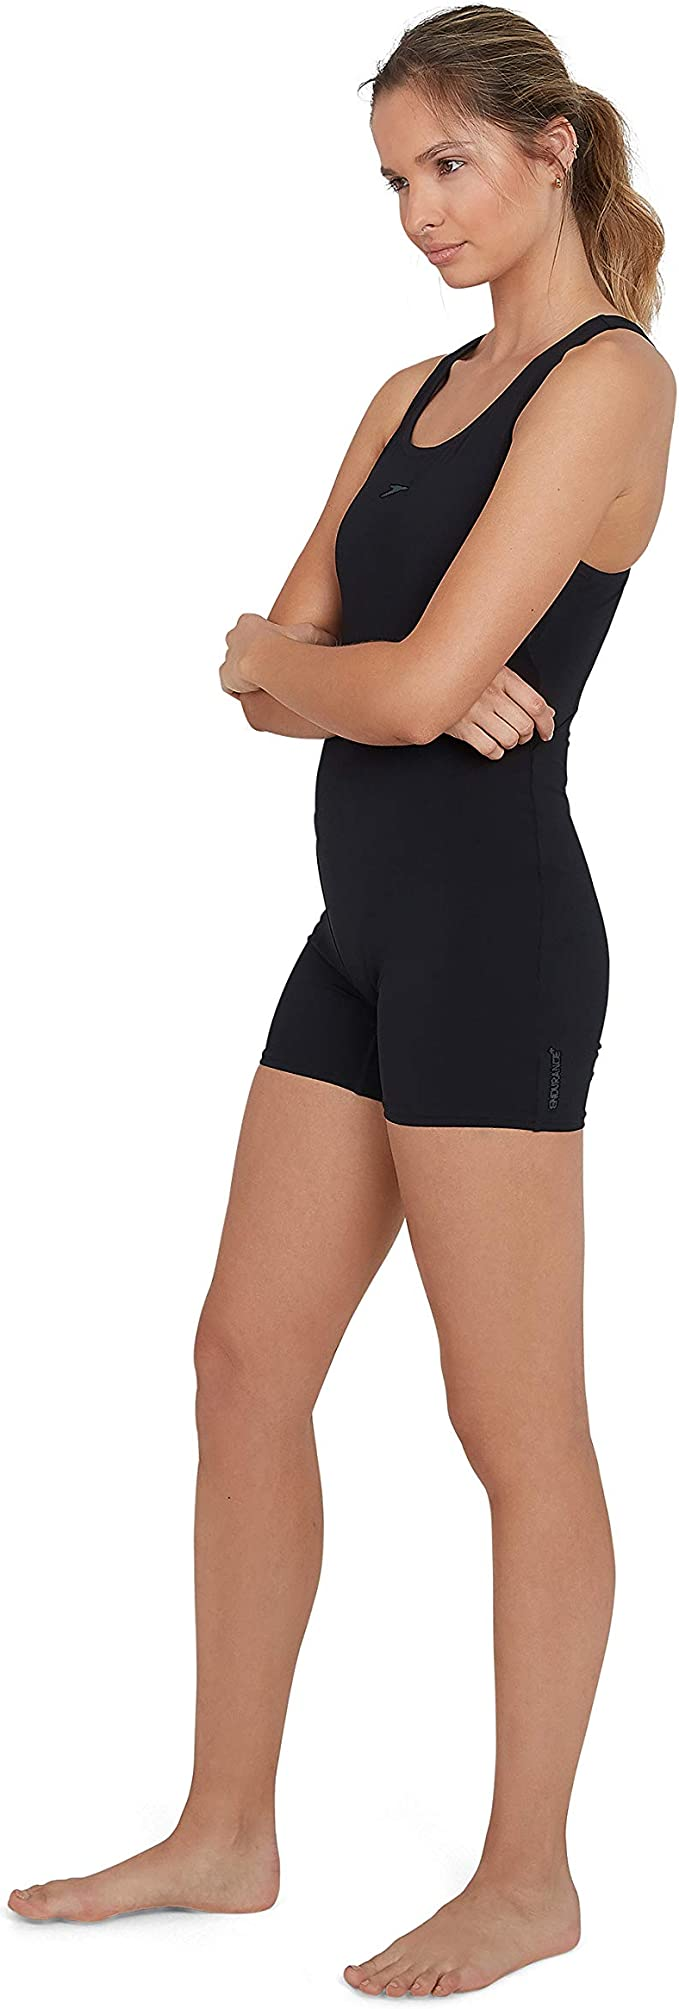 Speedo Essential Endurance Legsuit W Traje De Ba/ño Culote Adult Female